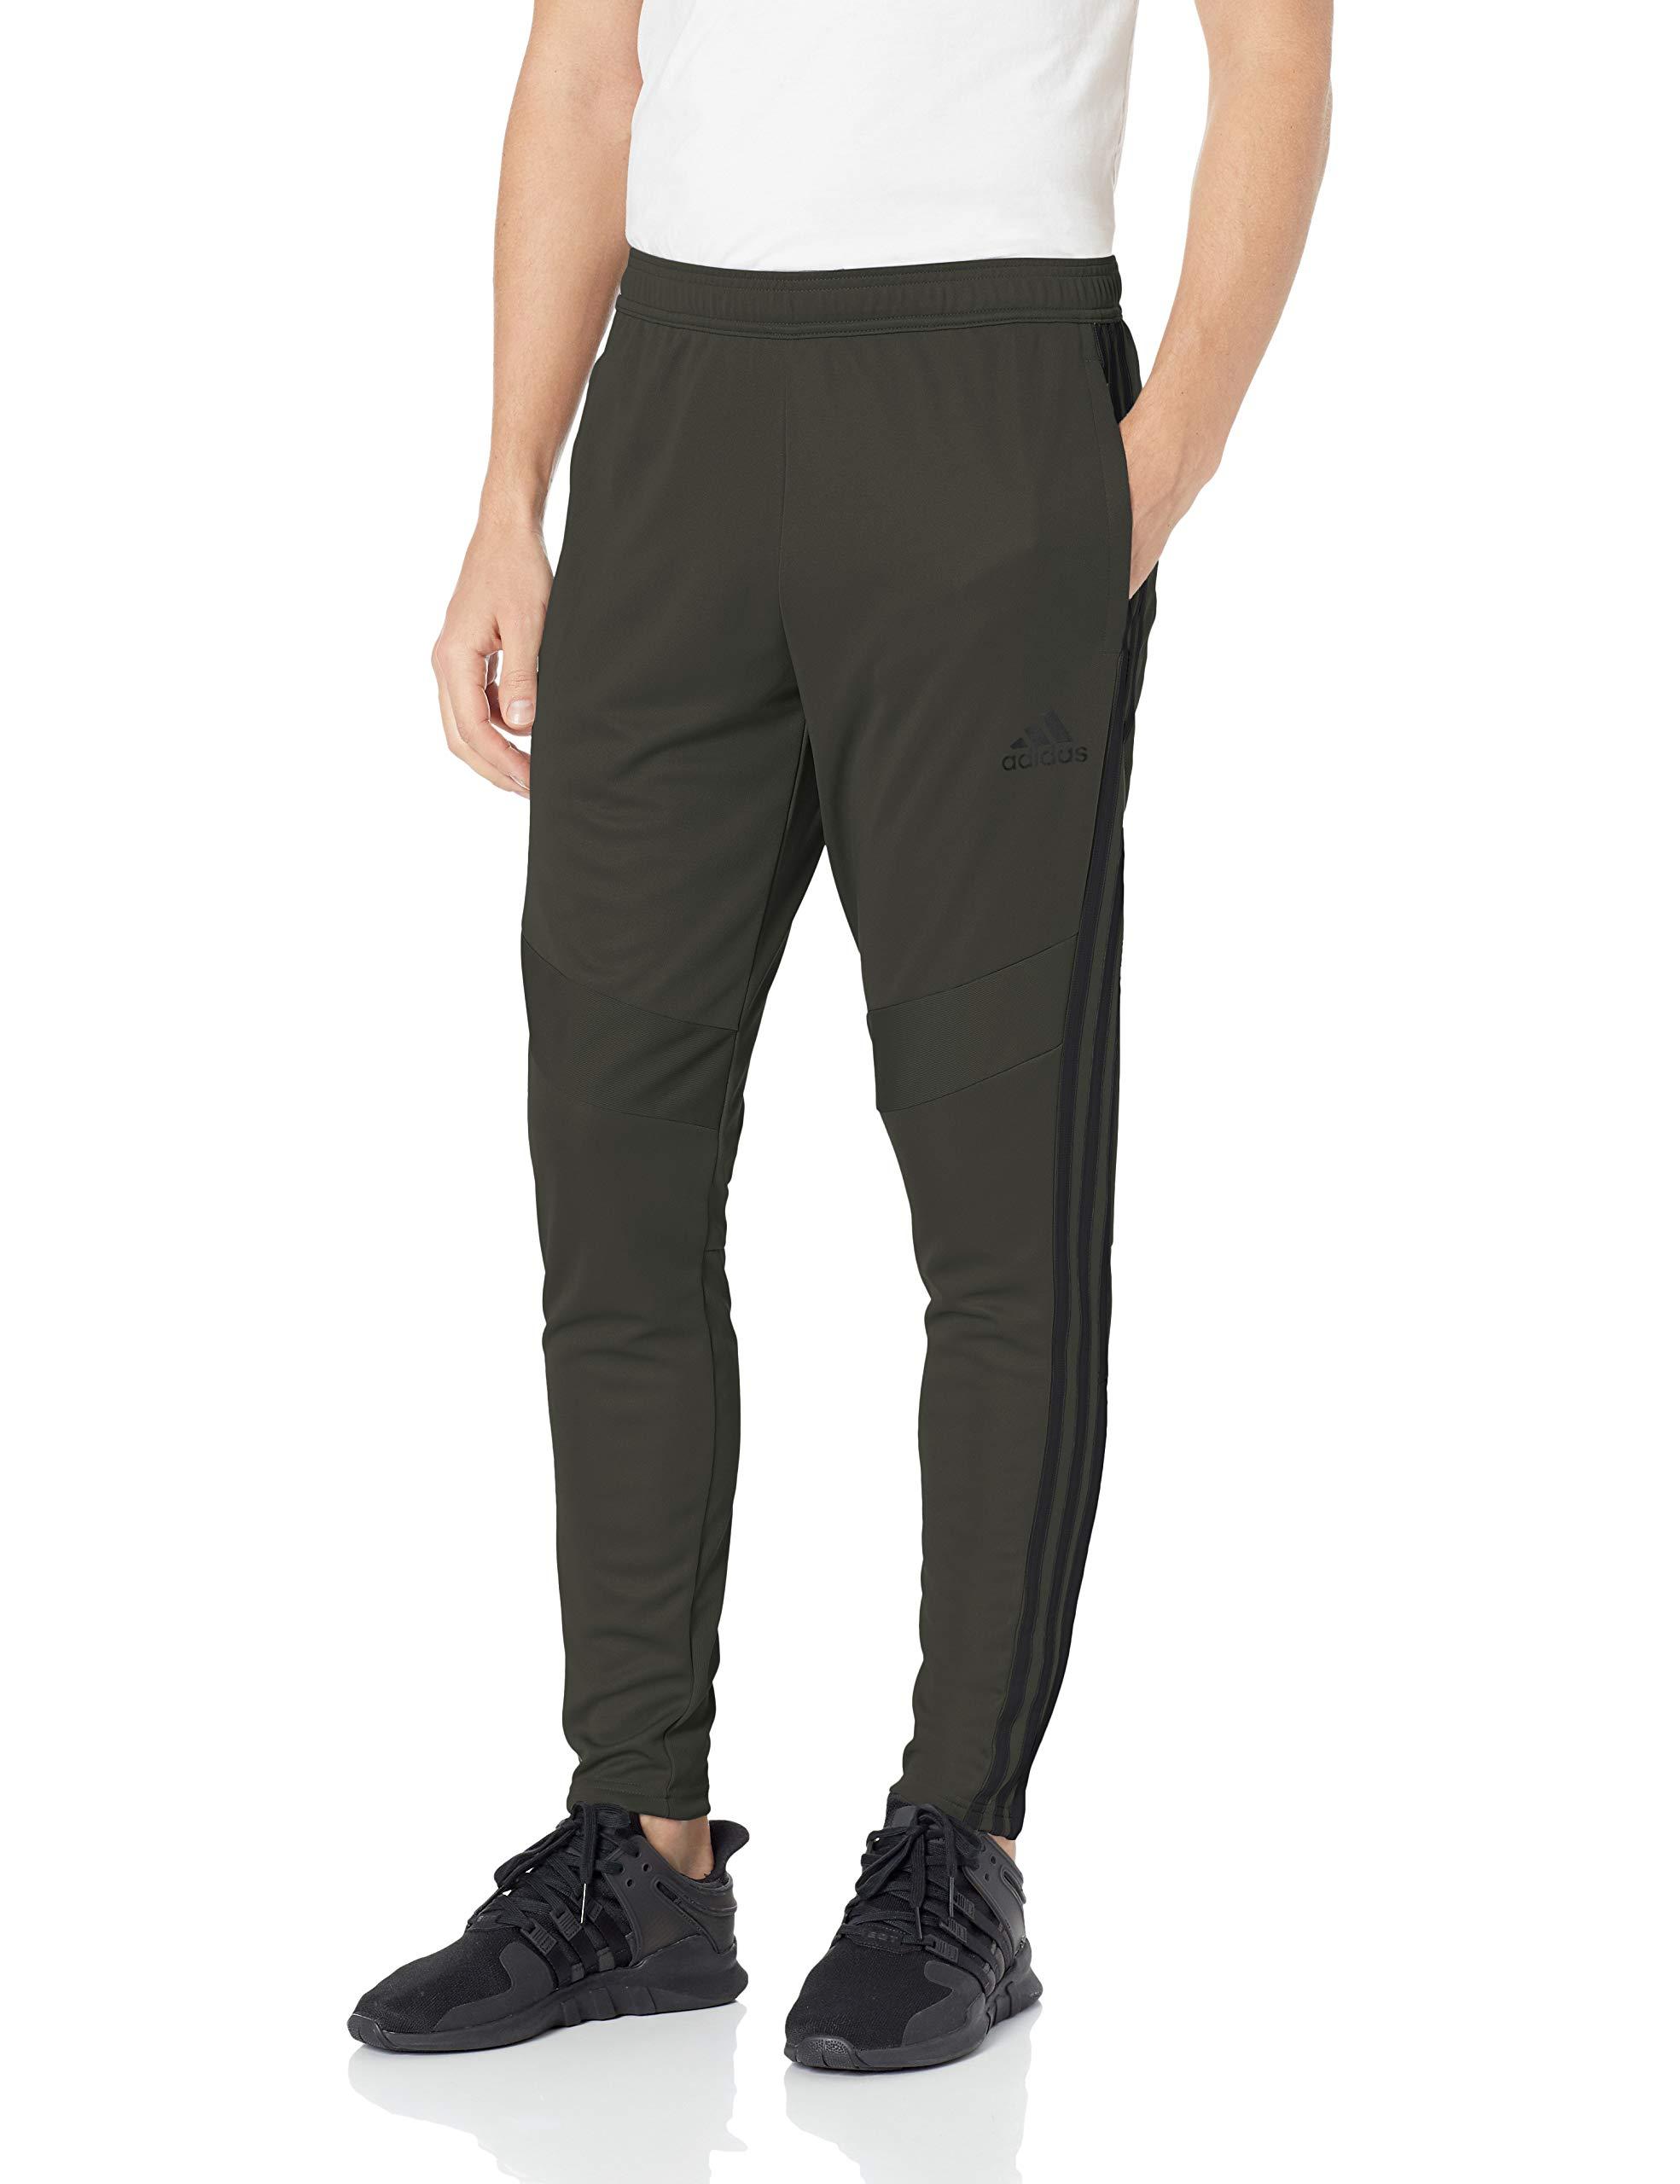 adidas Tiro19 Pant, Dark Green, XX-Large